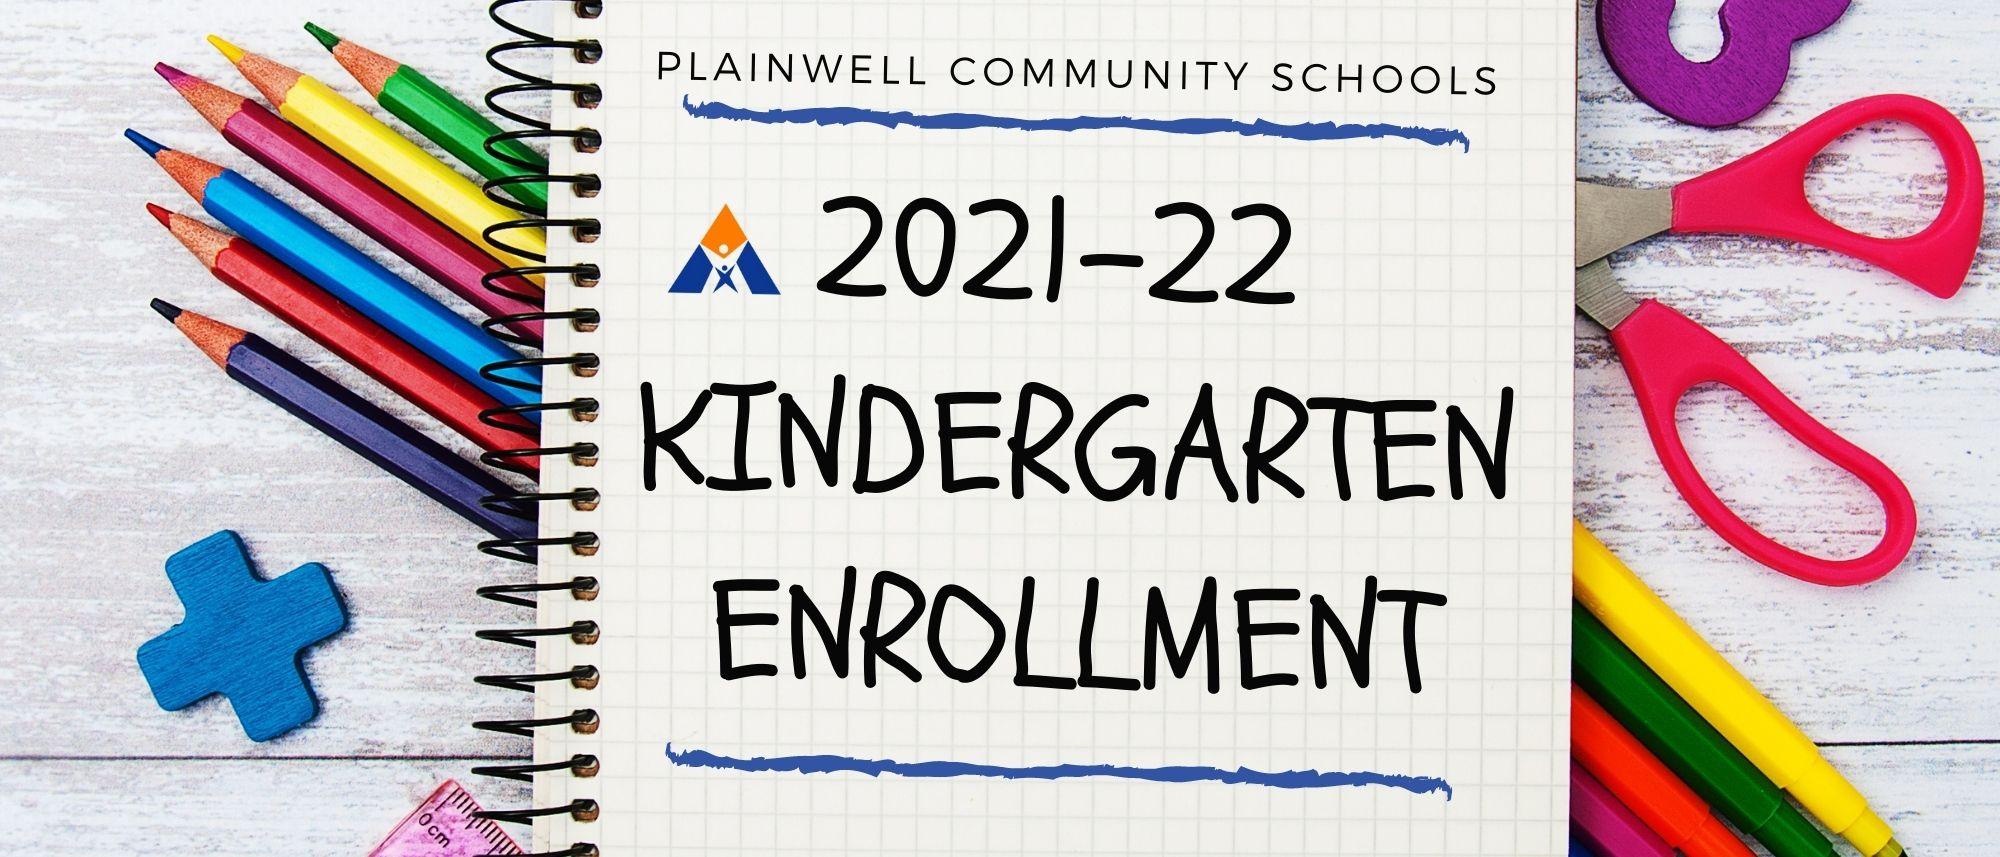 2021-22 Kindergarten Enrollment Picture of notebook and school supplies